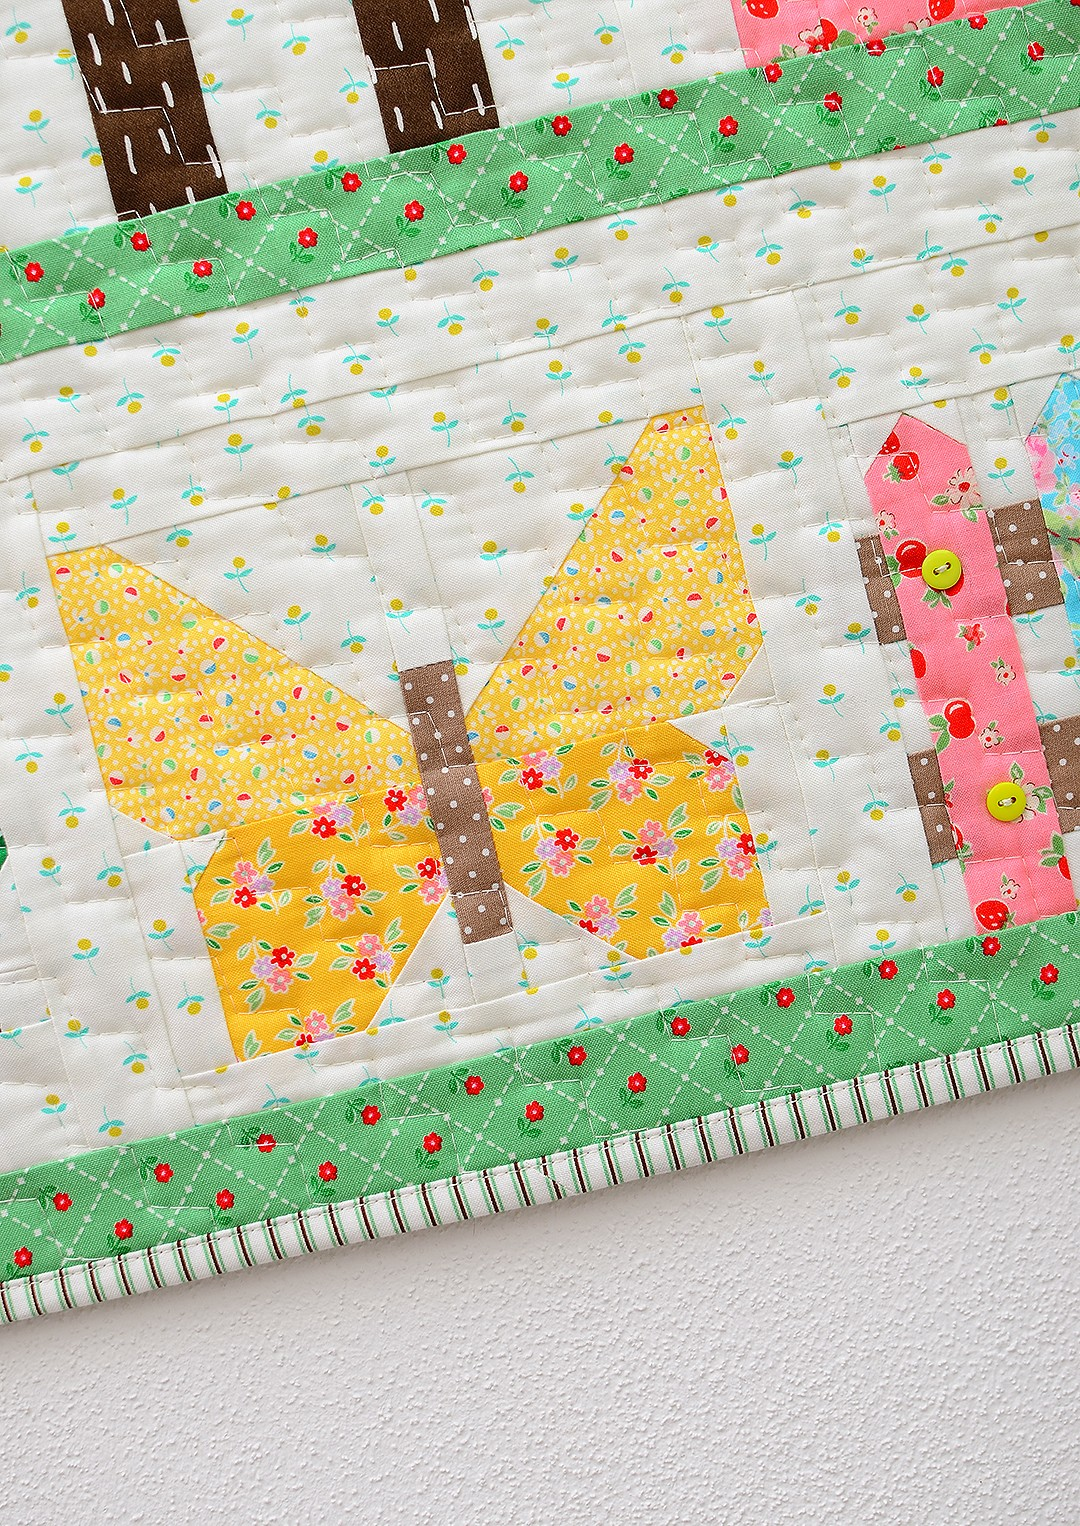 Country Garden quilt pattern - Mini